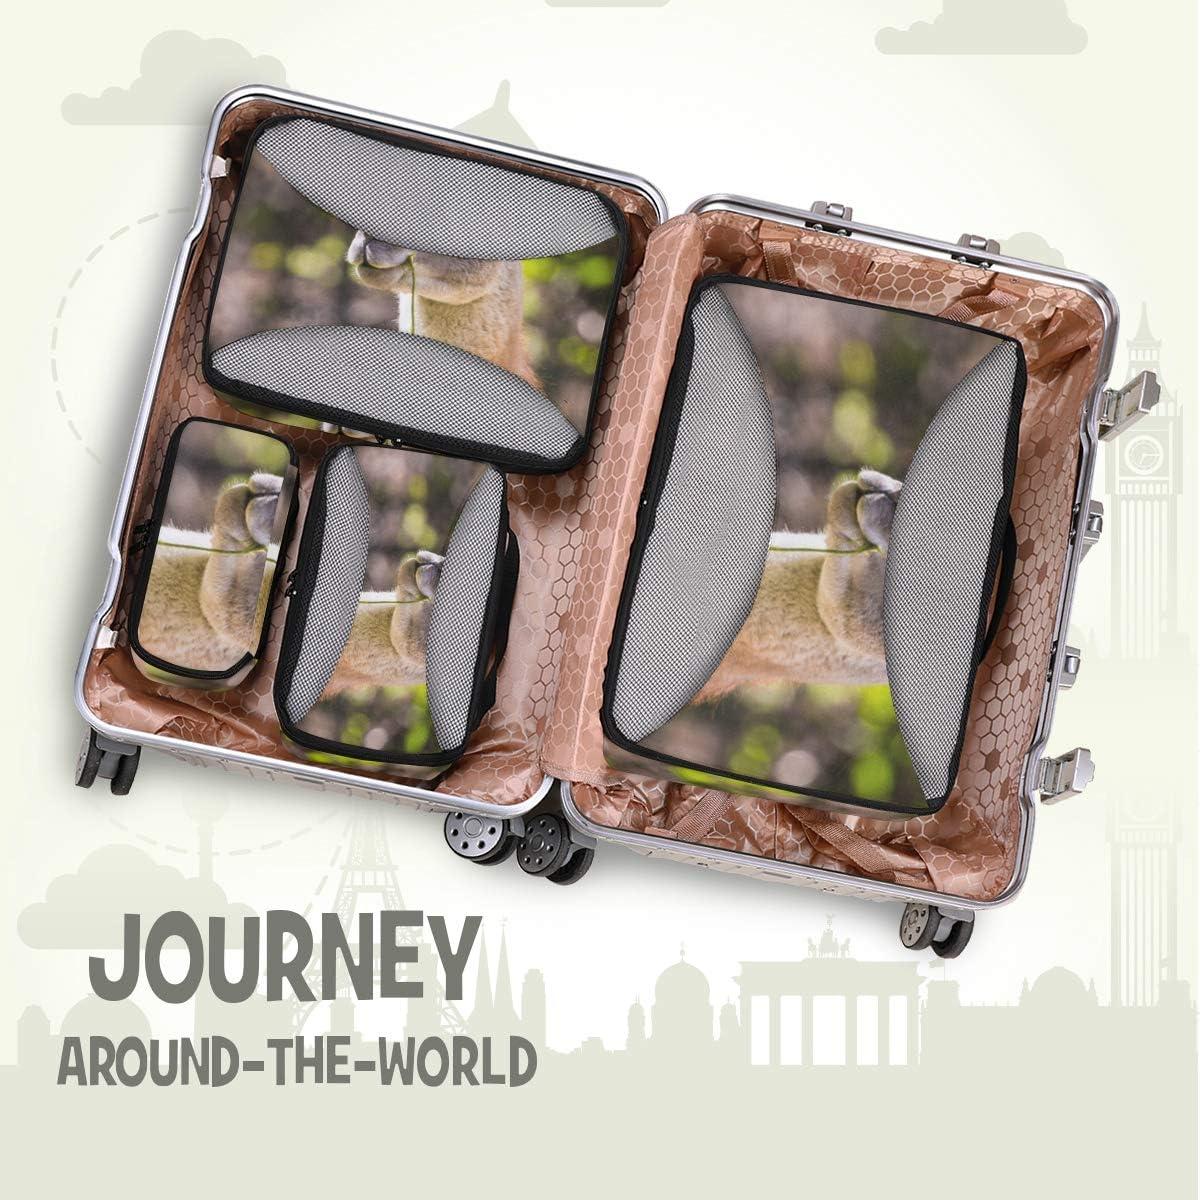 4 Set Packing Cubes Travel Luggage Packing Organizers Llama Portrait